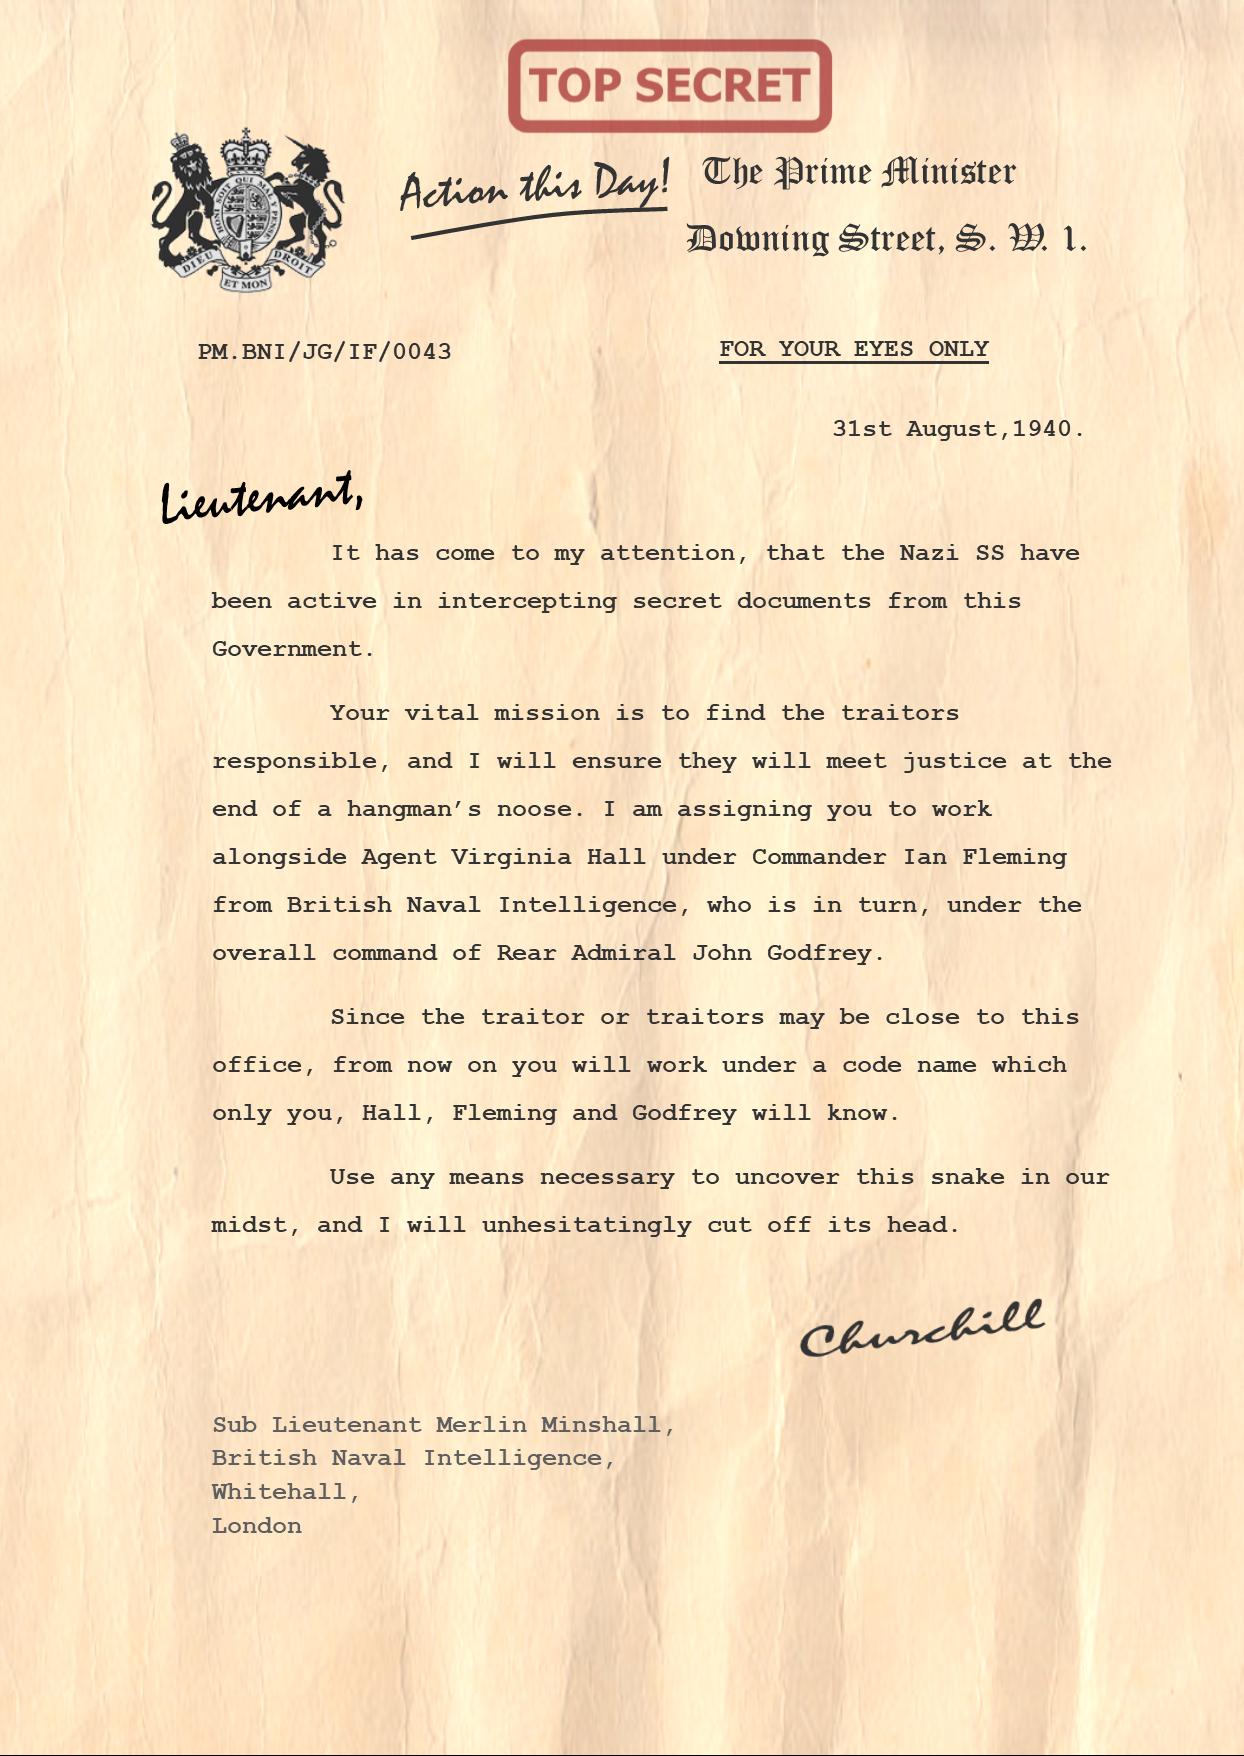 Churchill Letter to Sub Lieutenant Merlin Minshall PNG